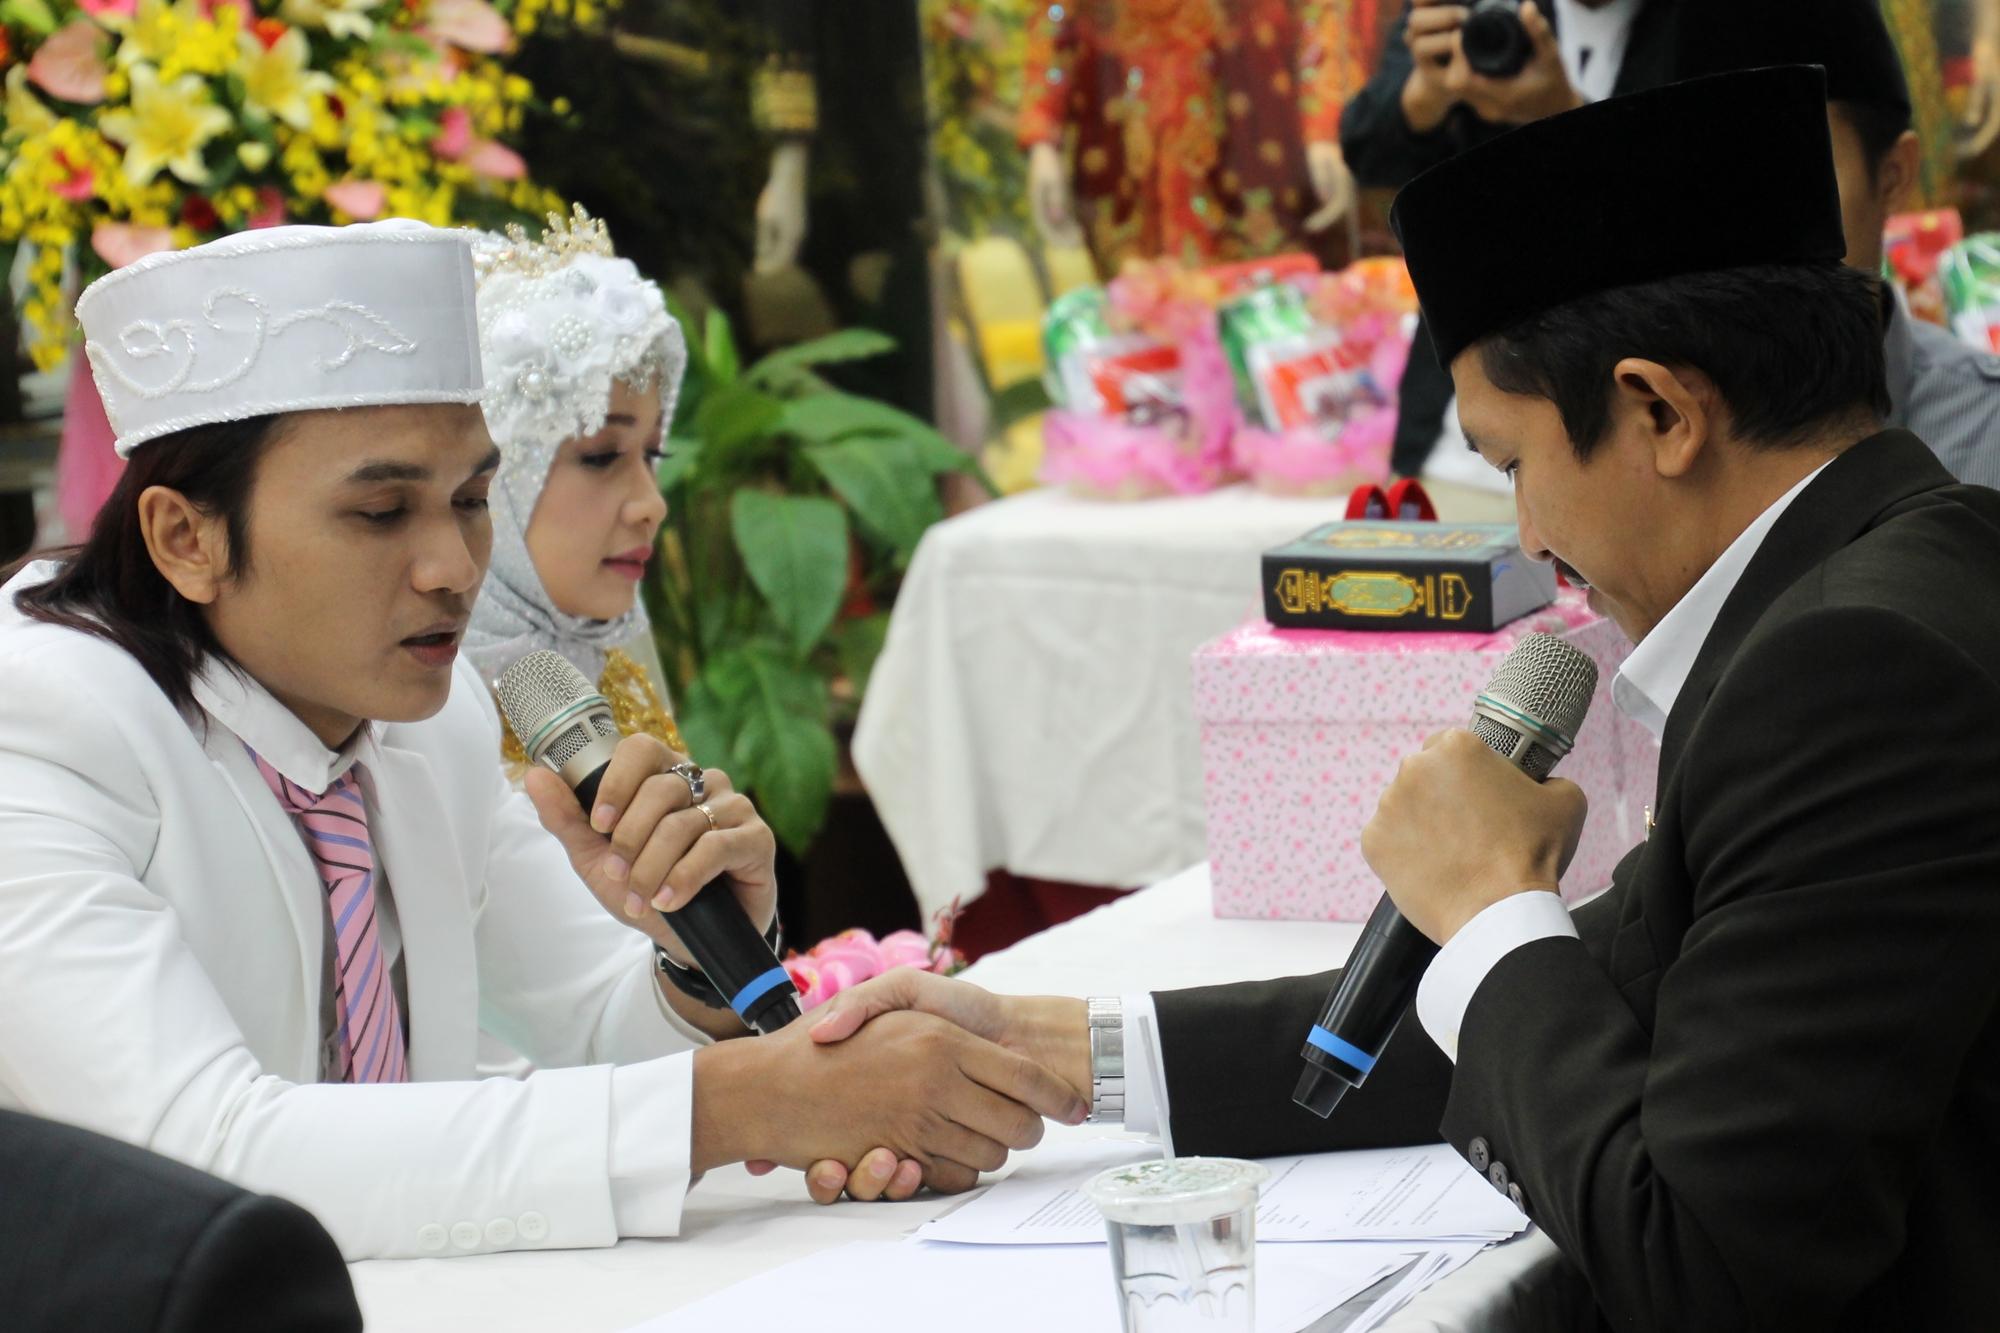 Menjadi TKI, 6 pasangan ini merajut cinta hingga nikah di negeri orang